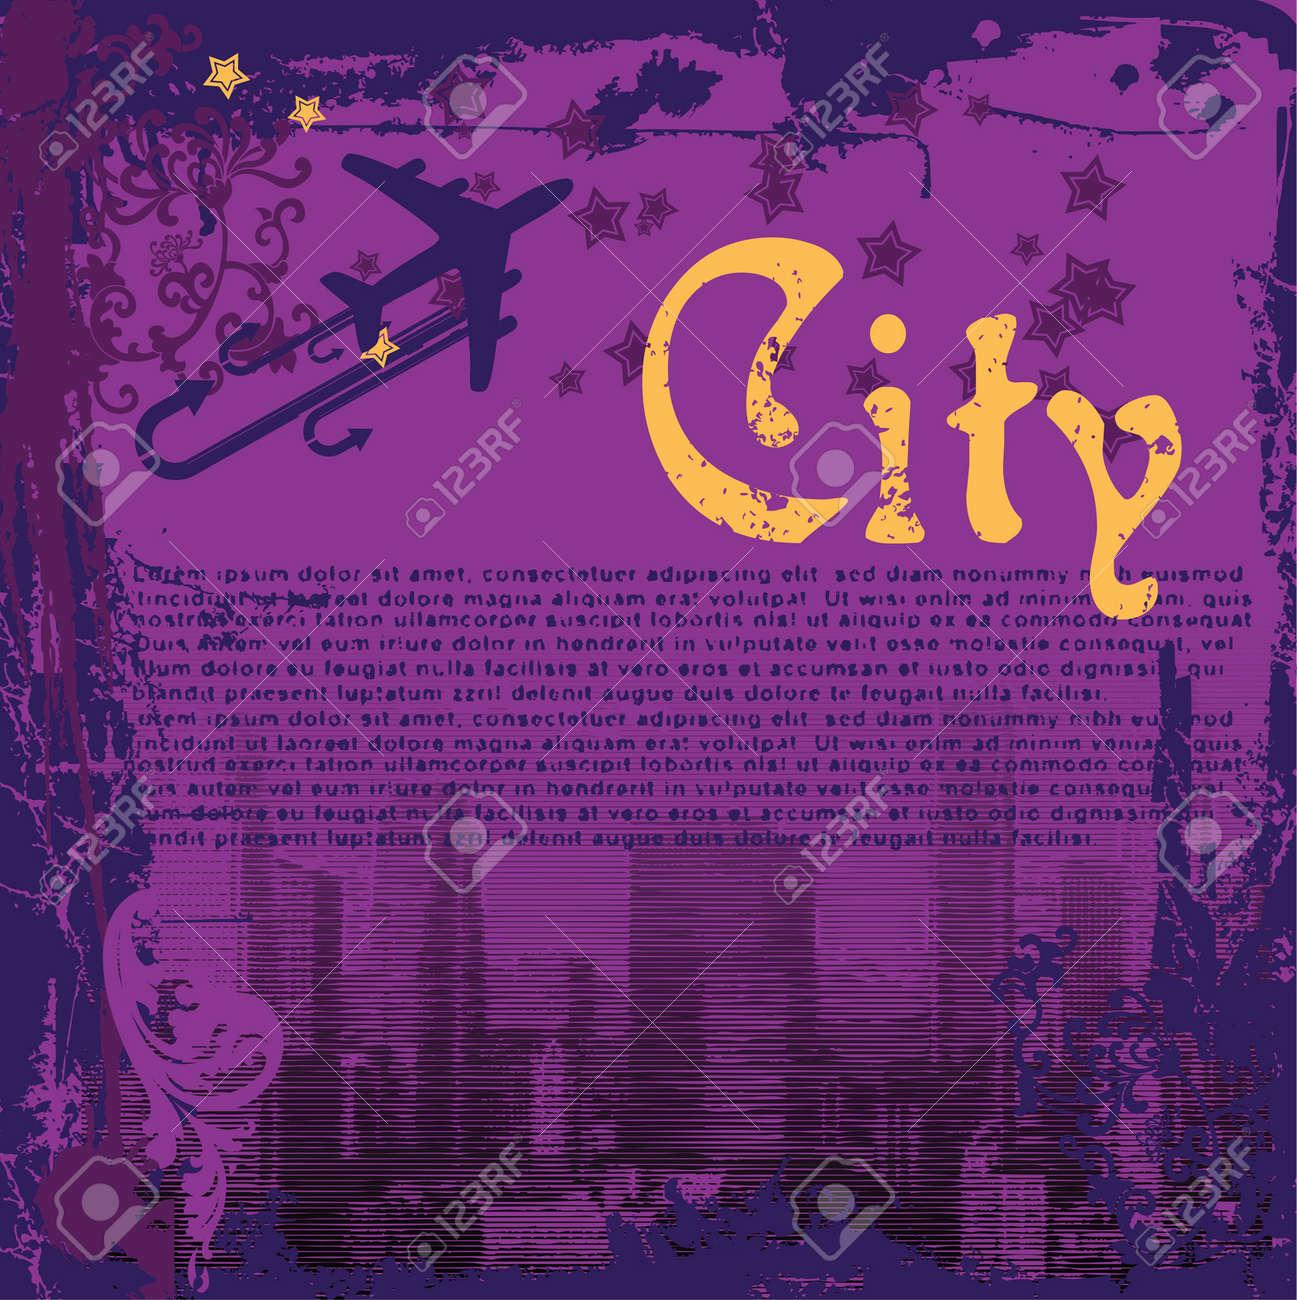 Grunge Purple City Flayer Stock Vector - 3536384